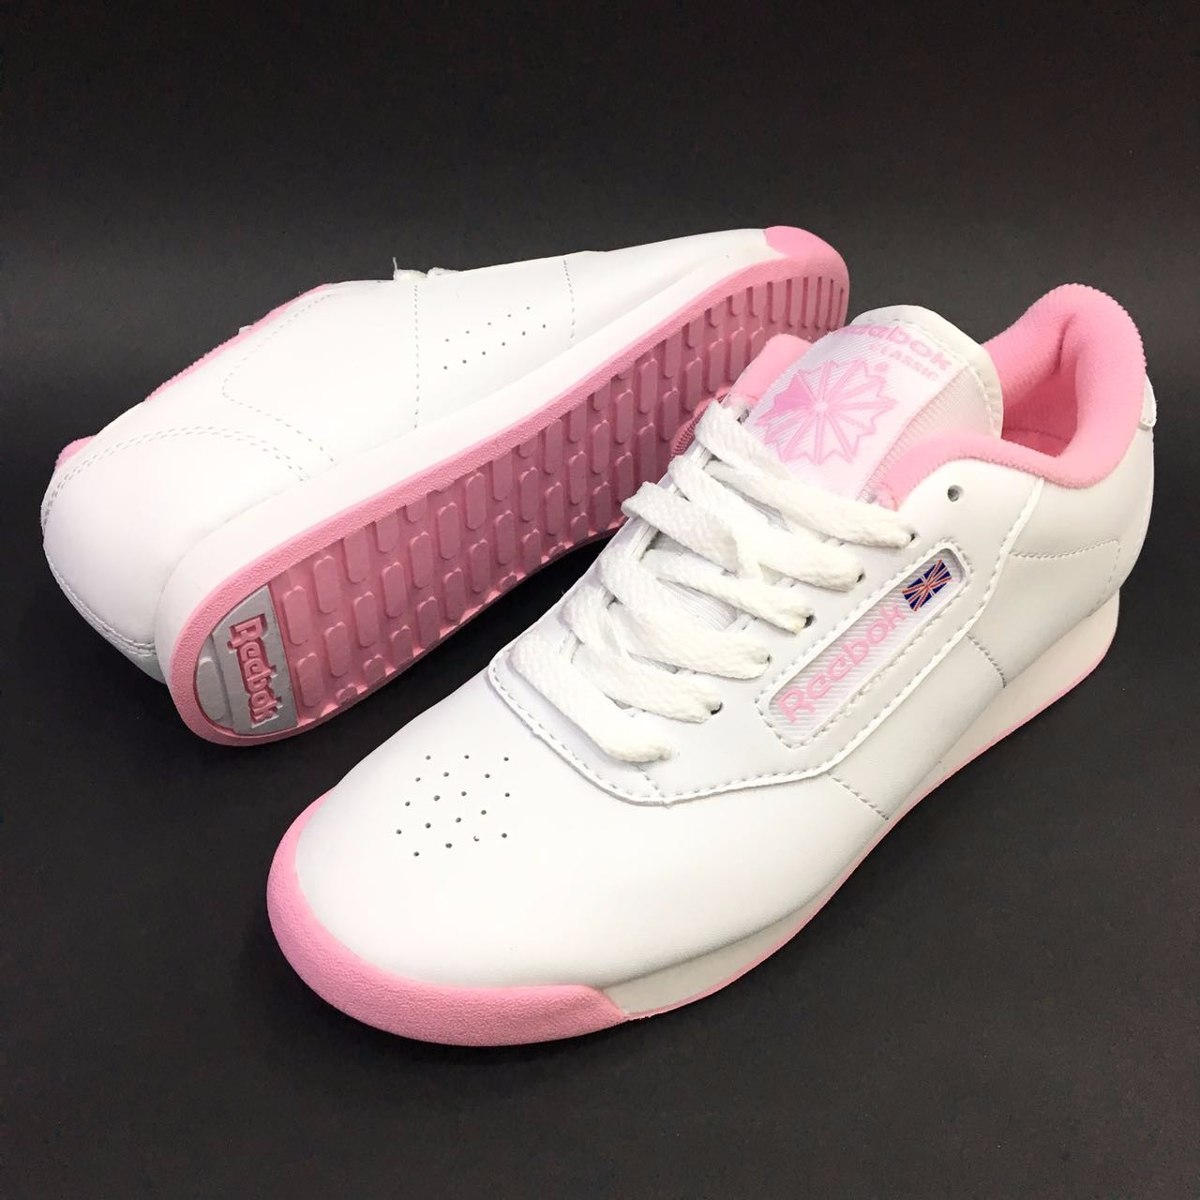 77930d579 catalogo tenis reebok para mujer